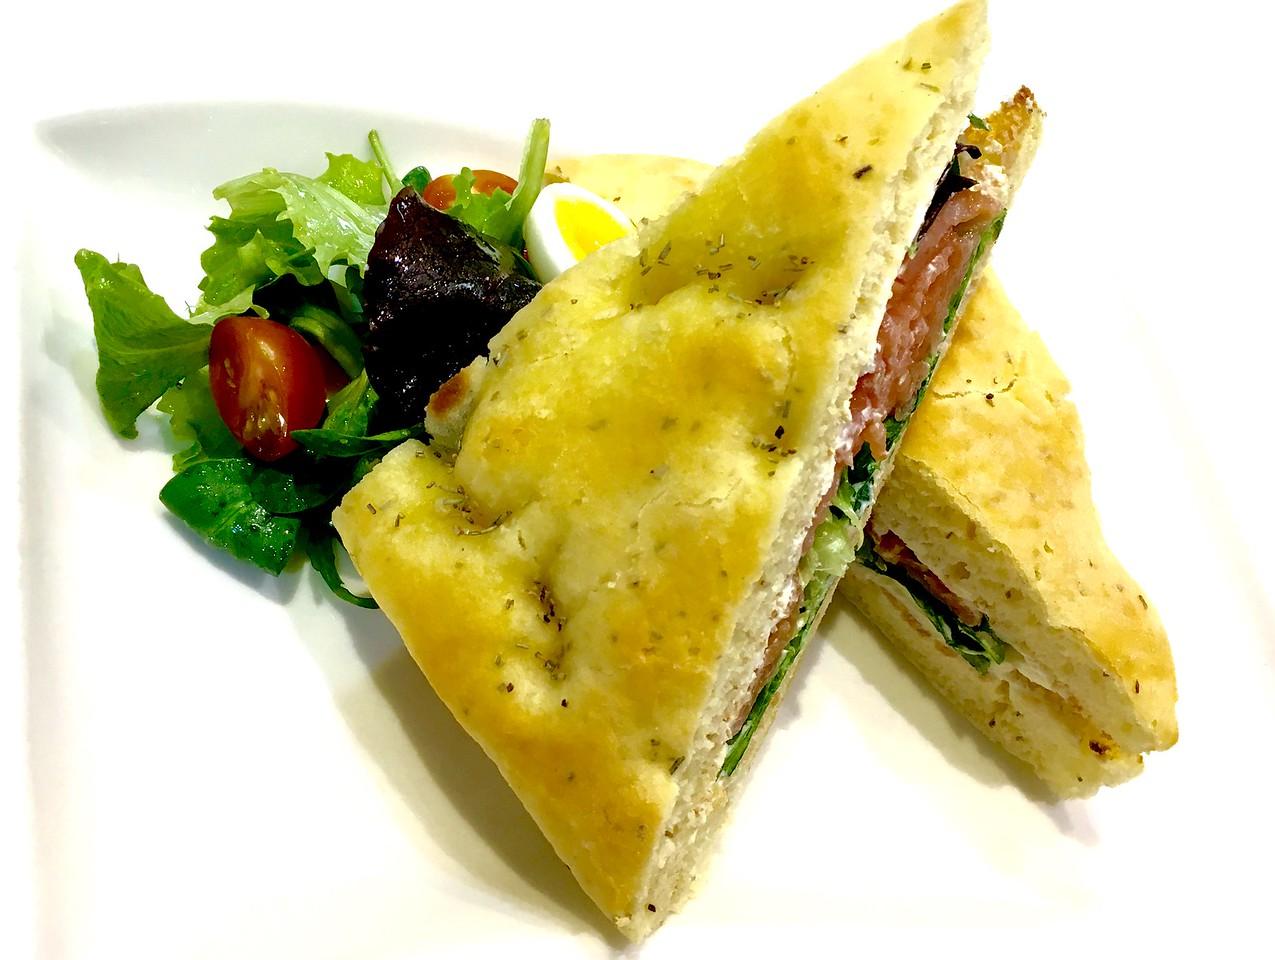 Focaccia sandwich with smoked salmon